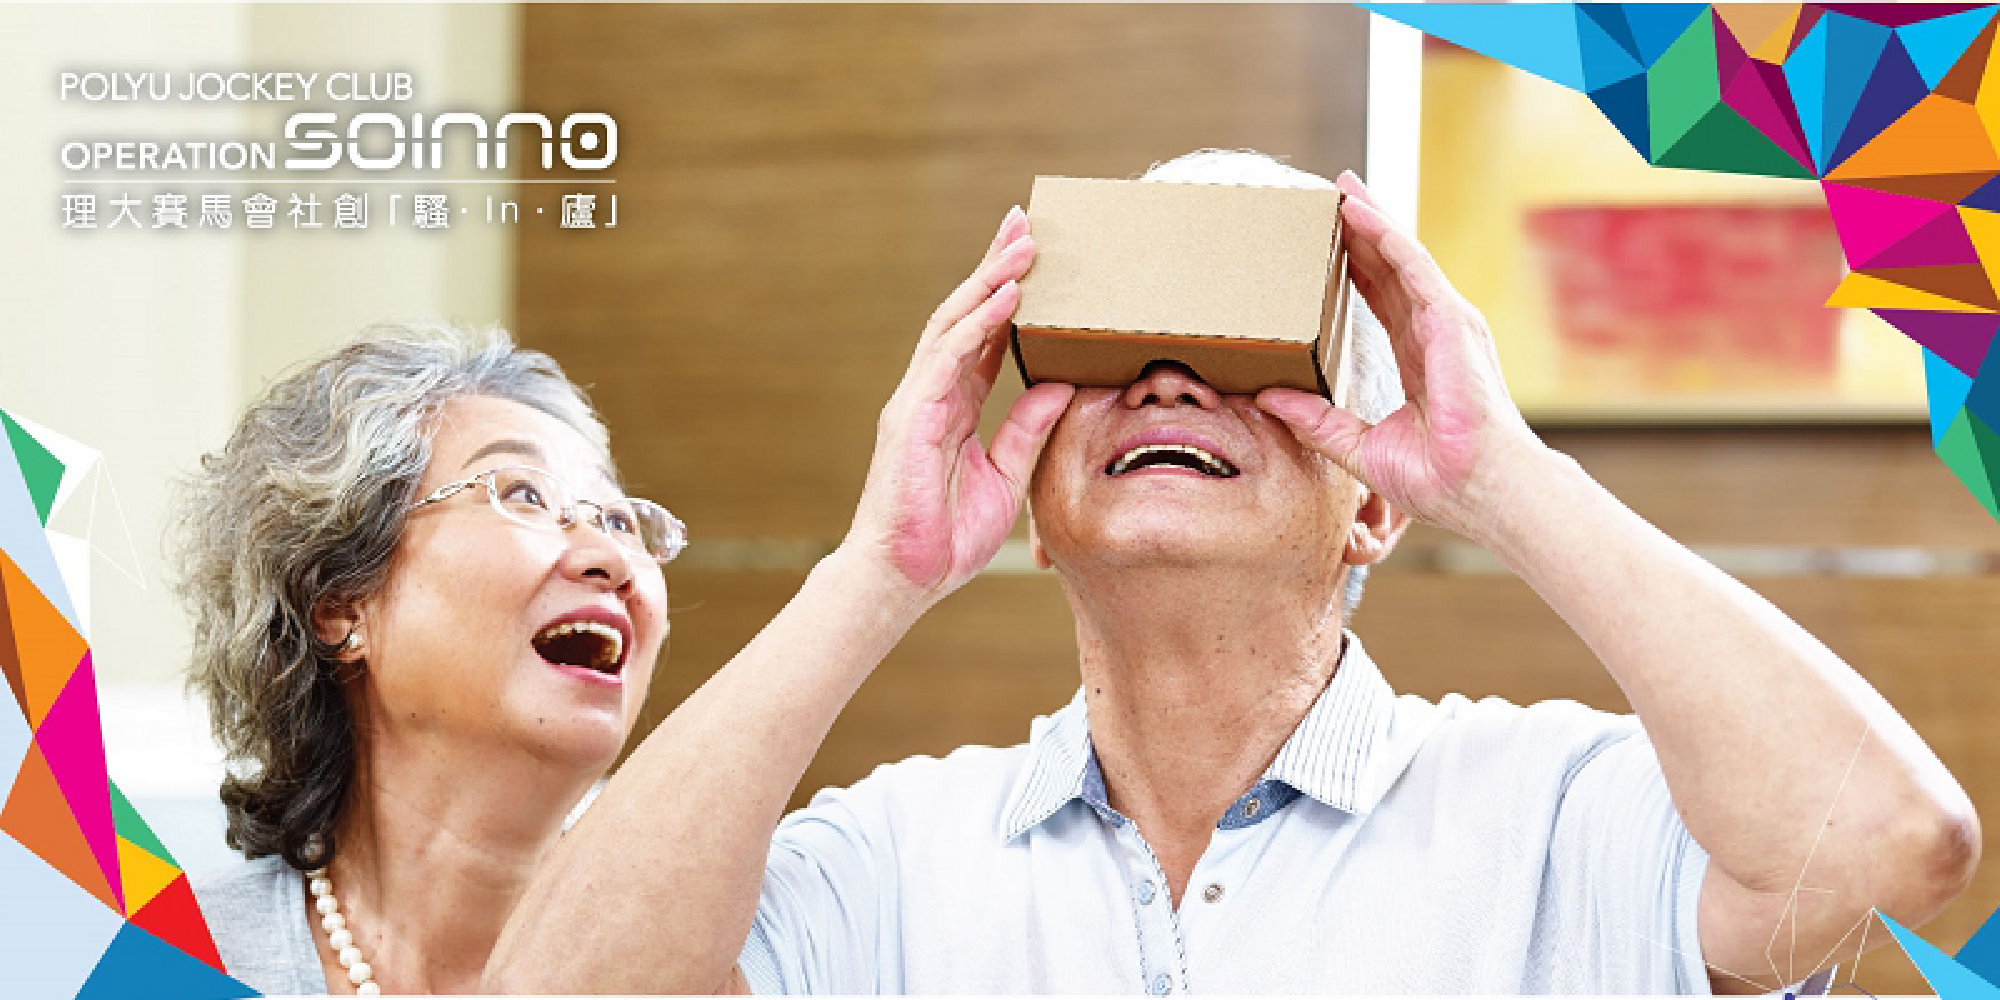 第五季:長者中心再想像共創工作坊及研討會 | Season 5: Re-imagine Elderly Centres Co-creation Workshops & Symposium